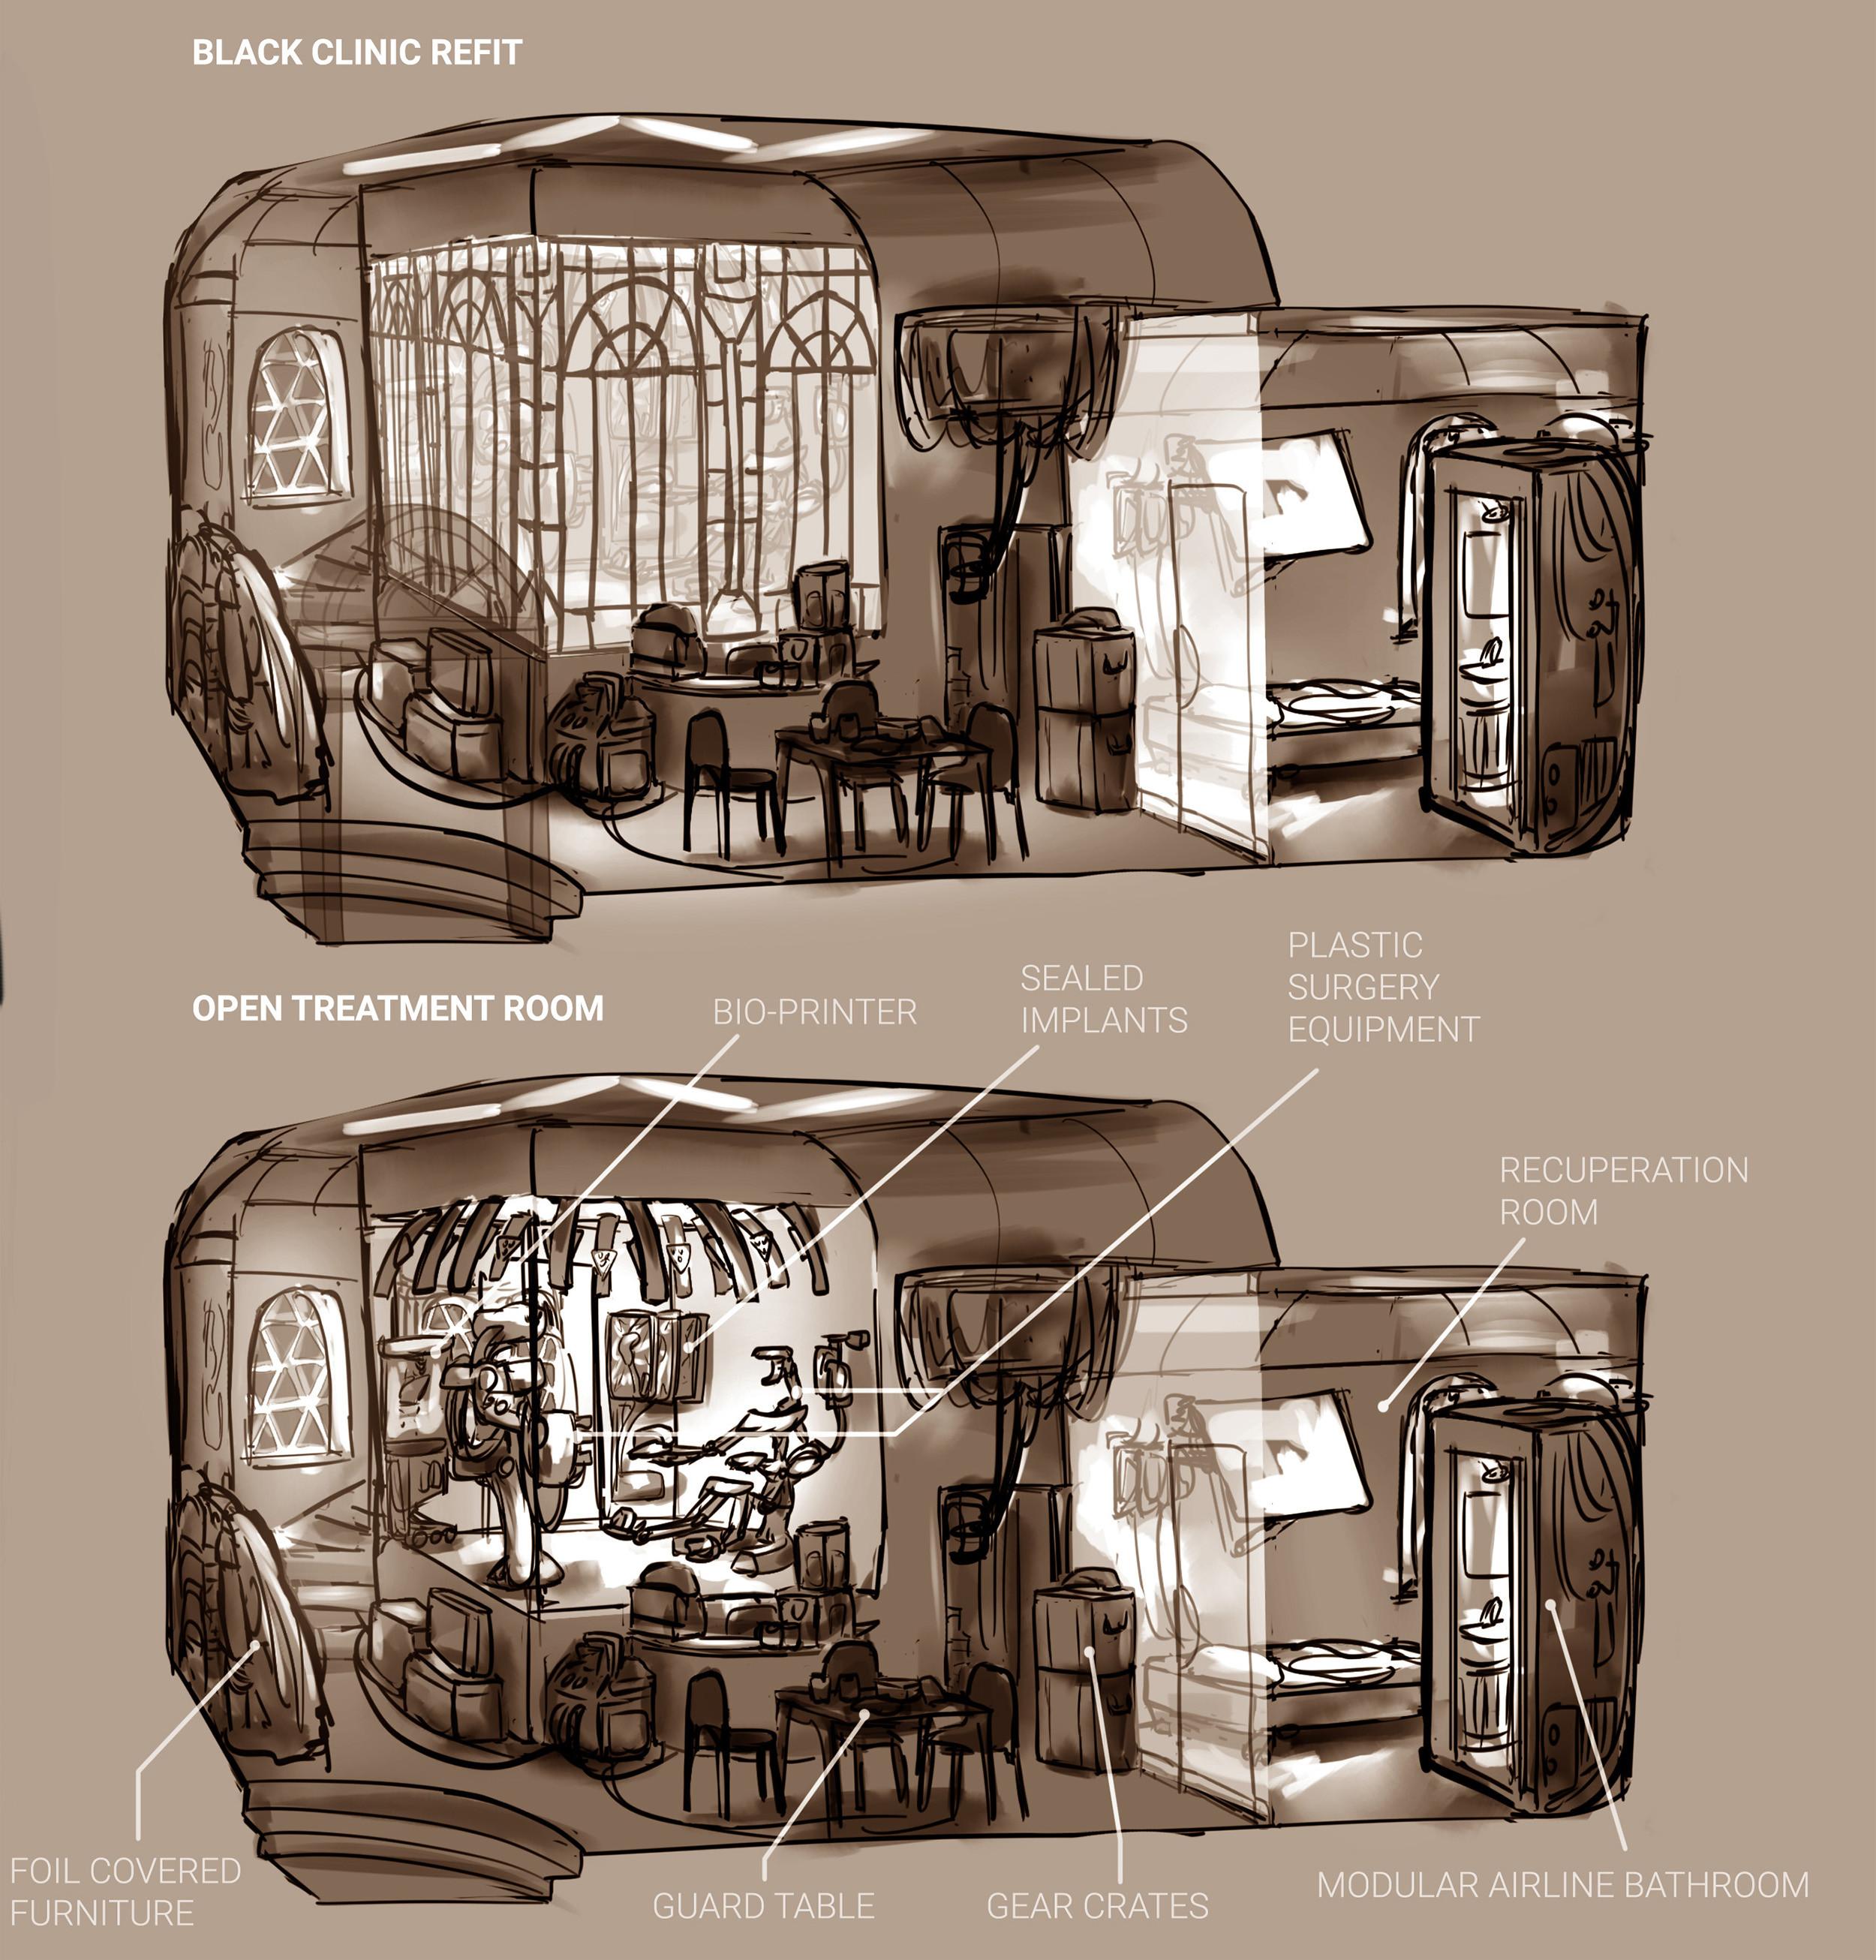 Sketches: Black clinic refit